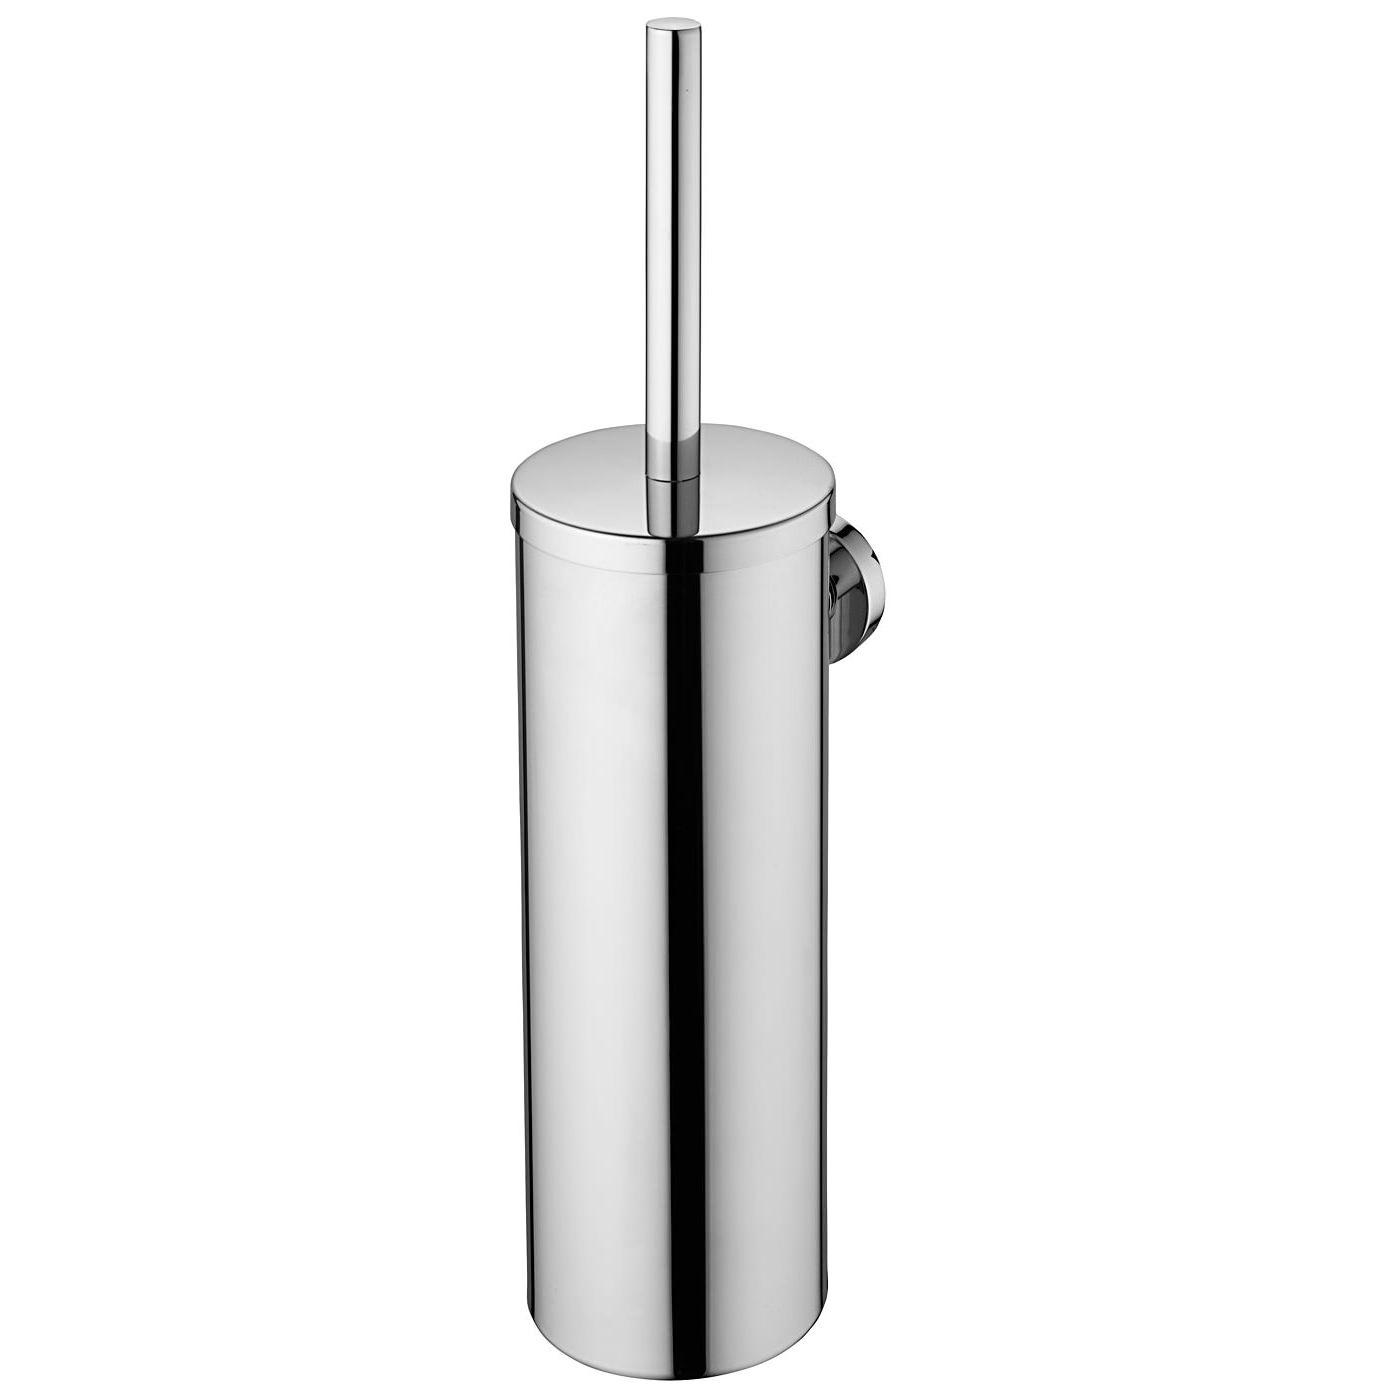 ideal standard iom chrome toilet brush and holder  amy - ideal standard iom chrome holder  brush